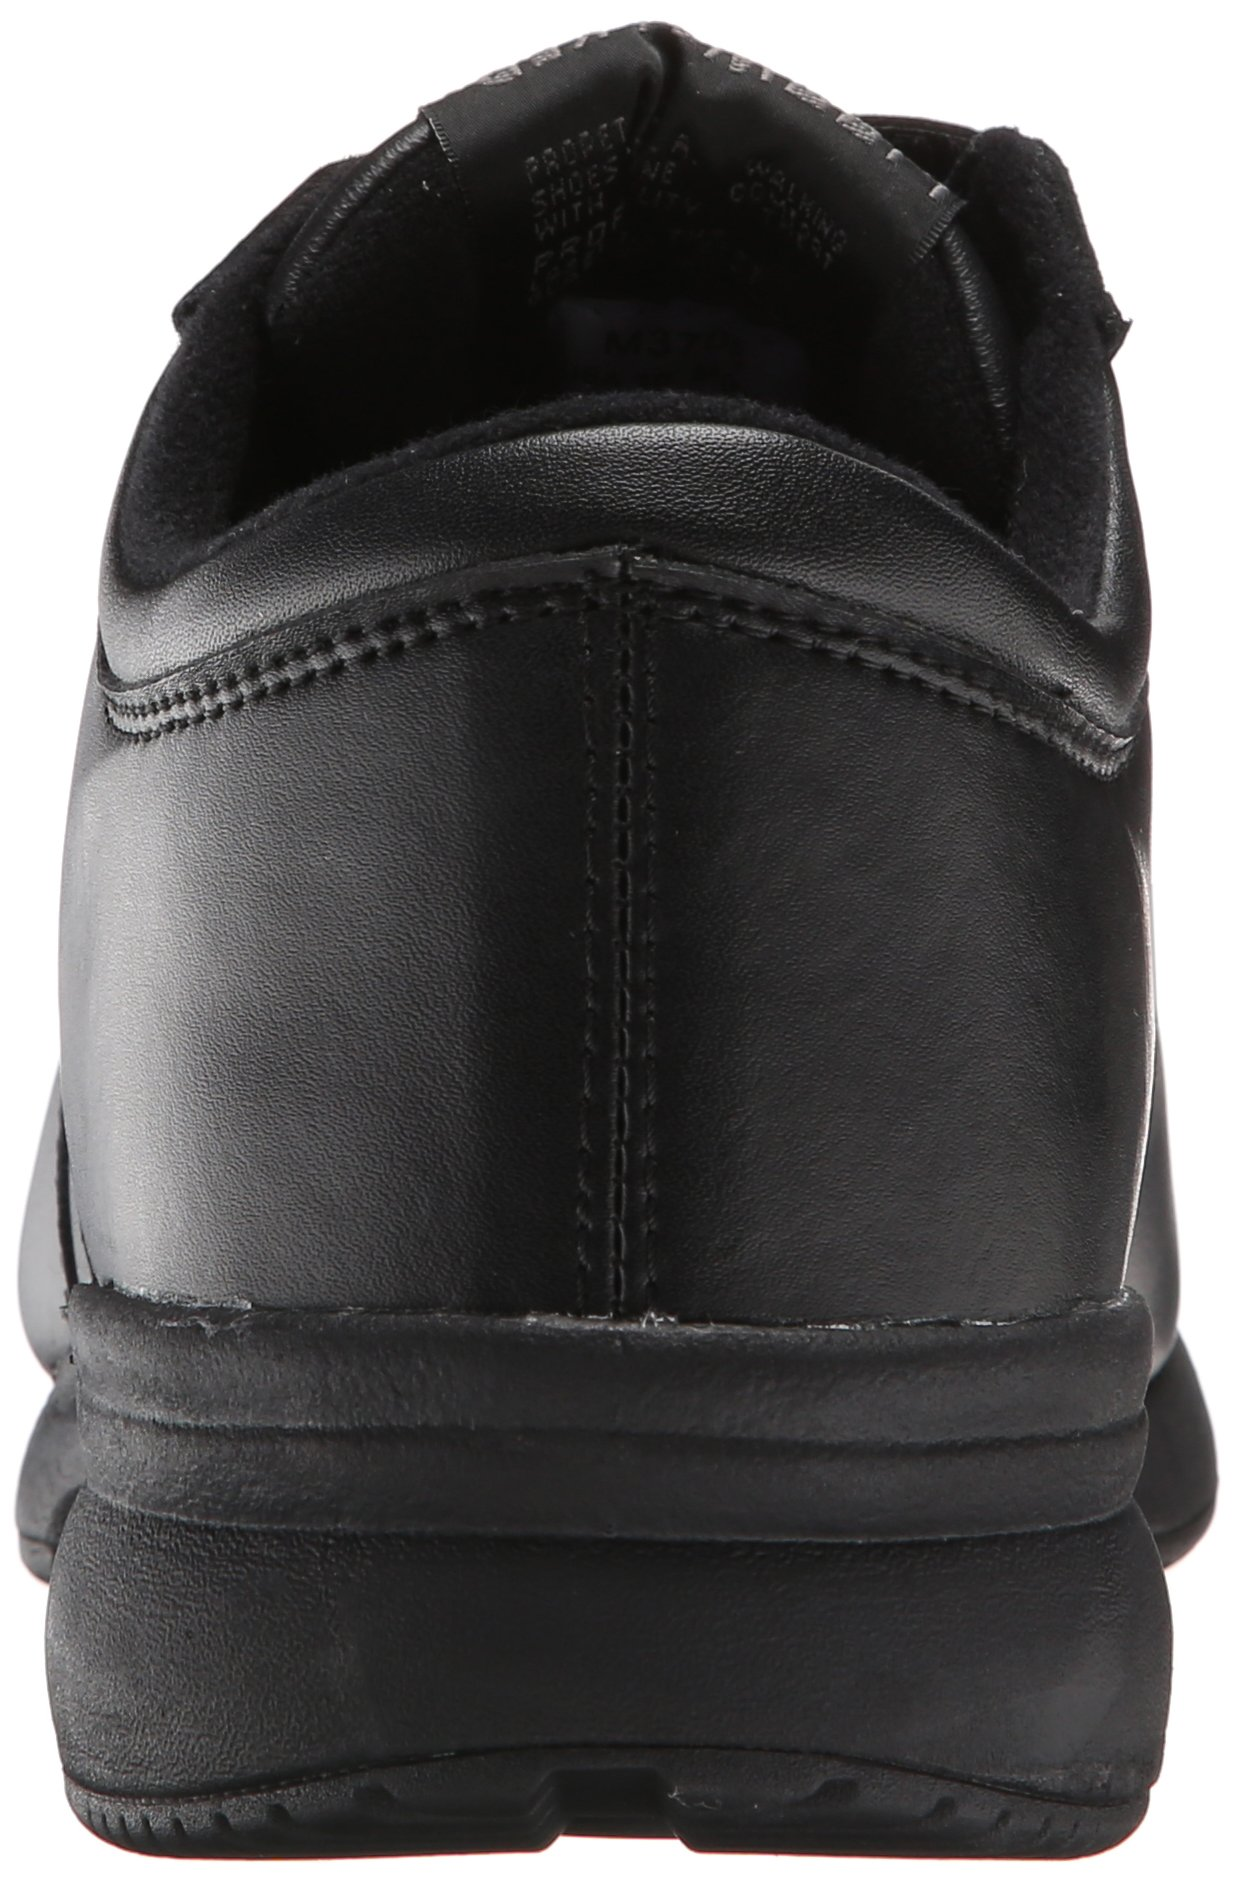 Propet-M3705-Men-039-s-LifeWalker-Strap-Walking-Shoes thumbnail 5